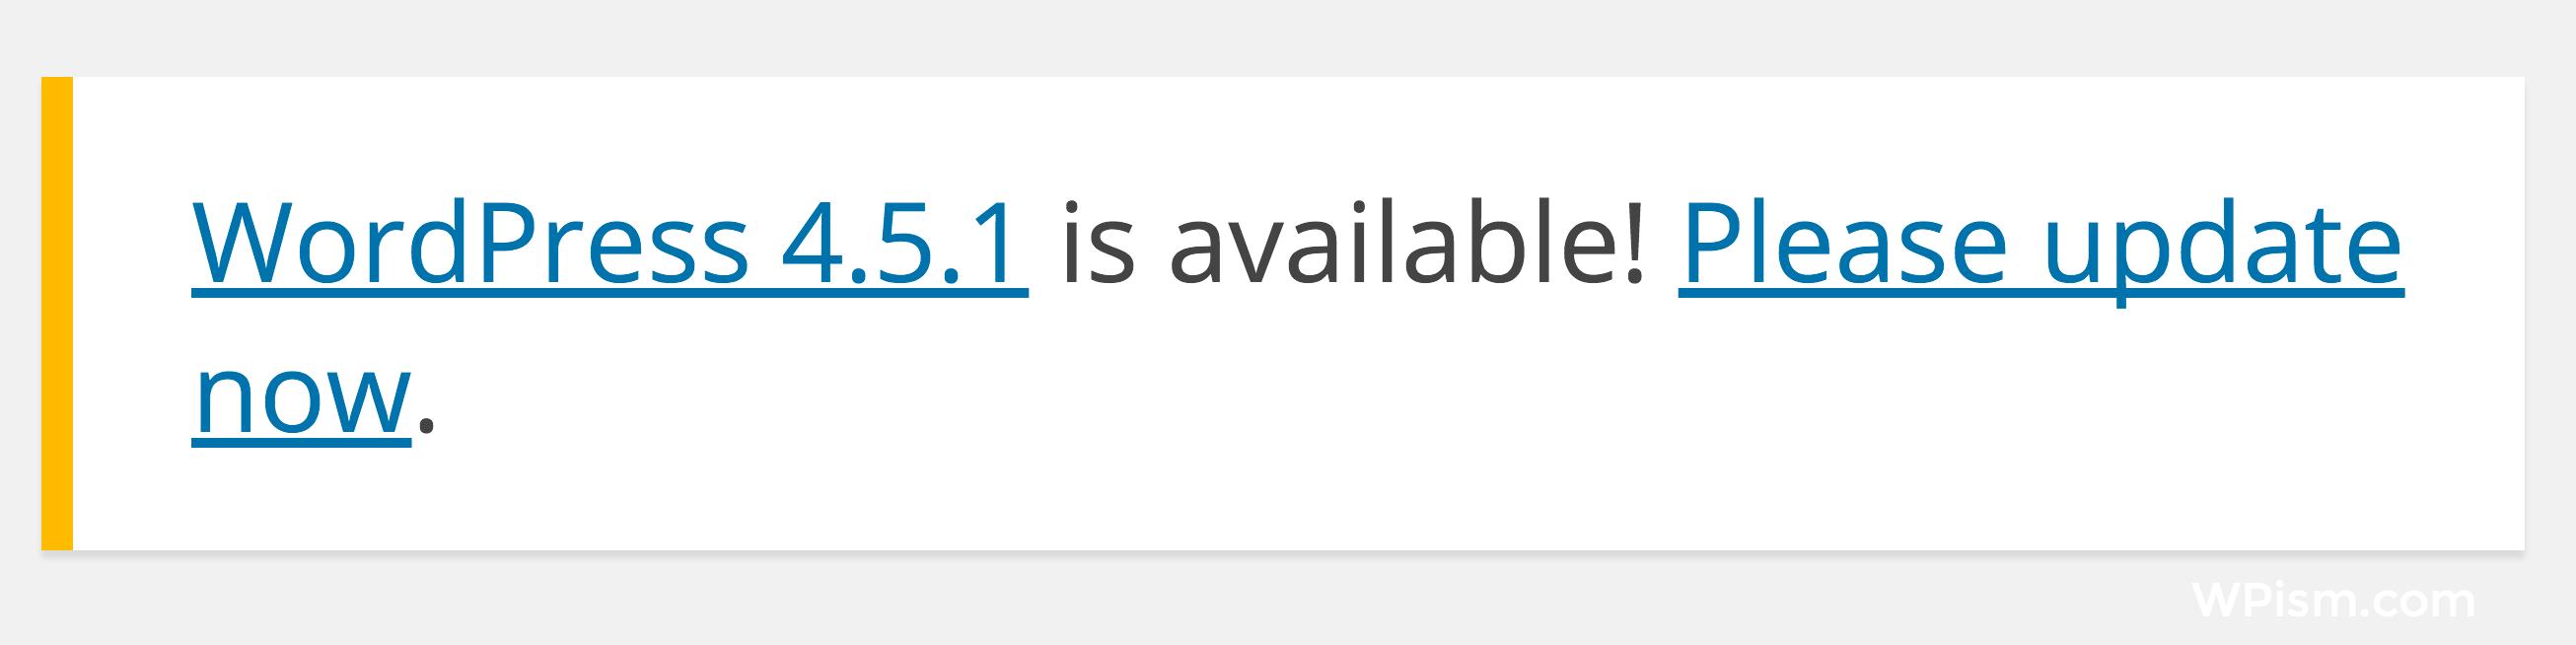 WordPress 4.5.1 Update Notification